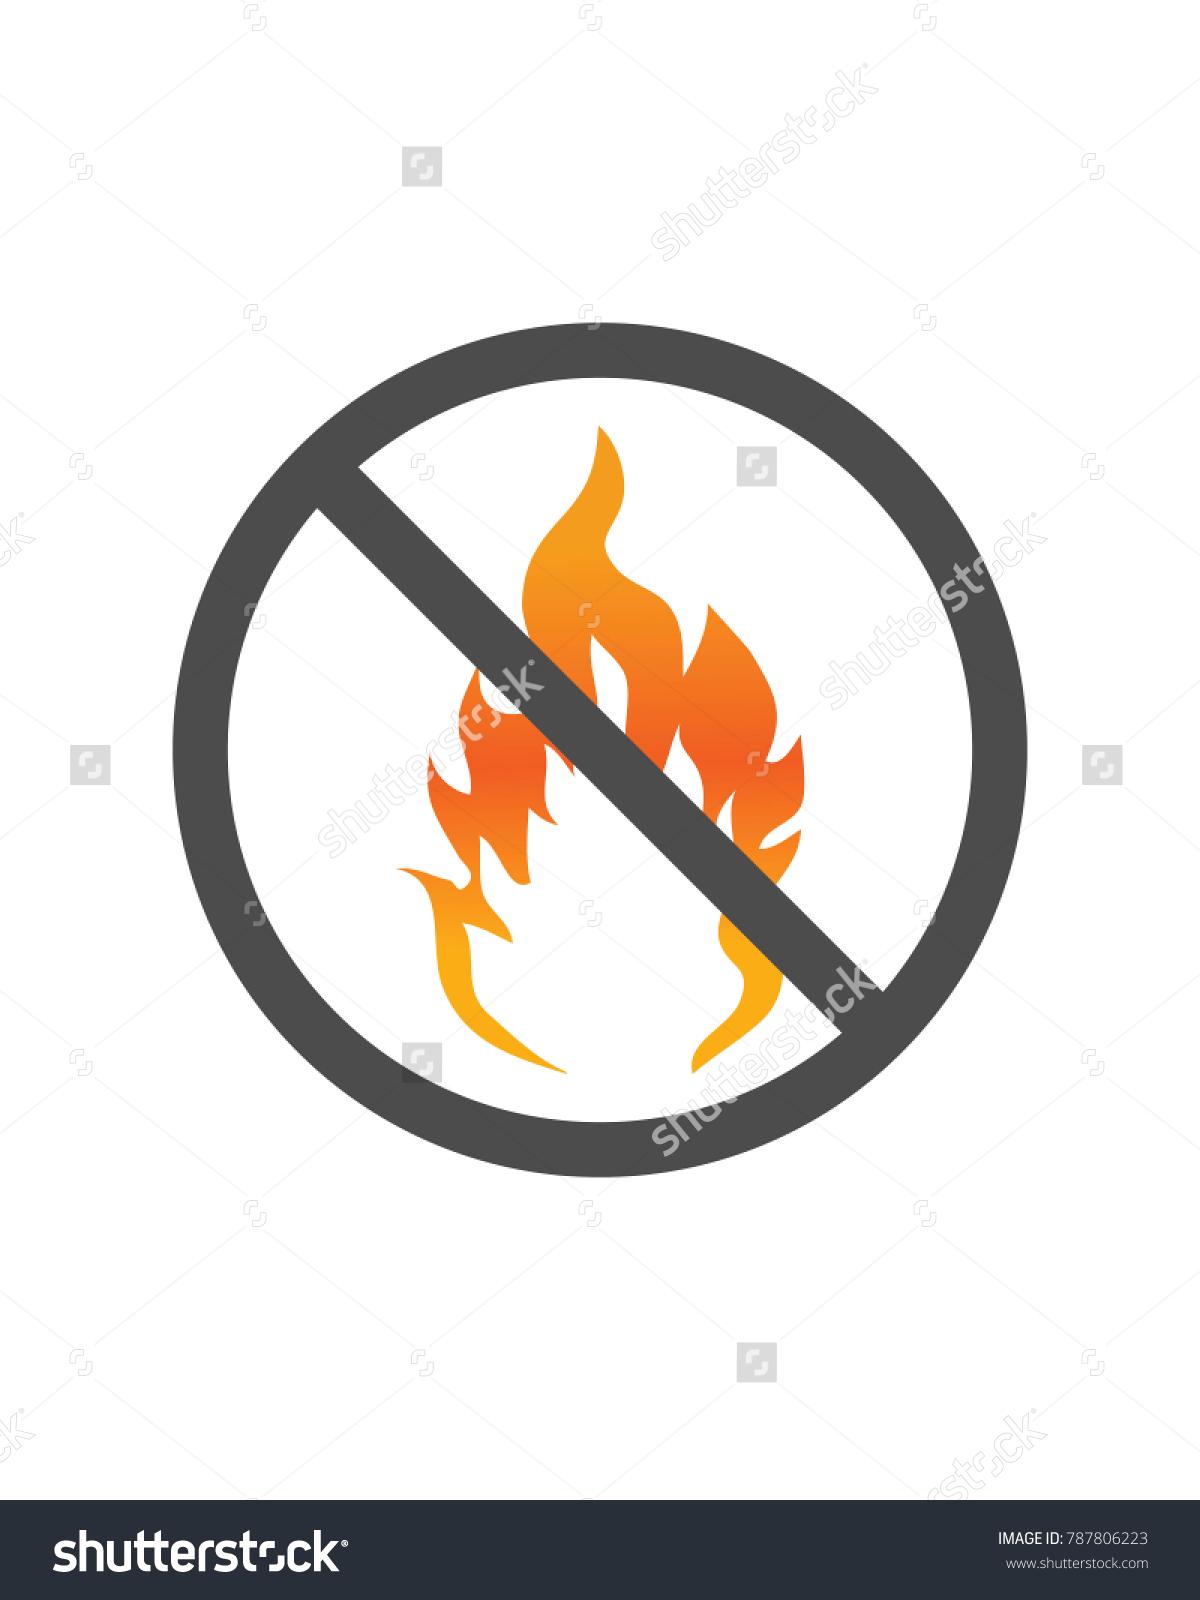 Hazard warning sign flammable stock vector 787806223 shutterstock hazard warning sign flammable buycottarizona